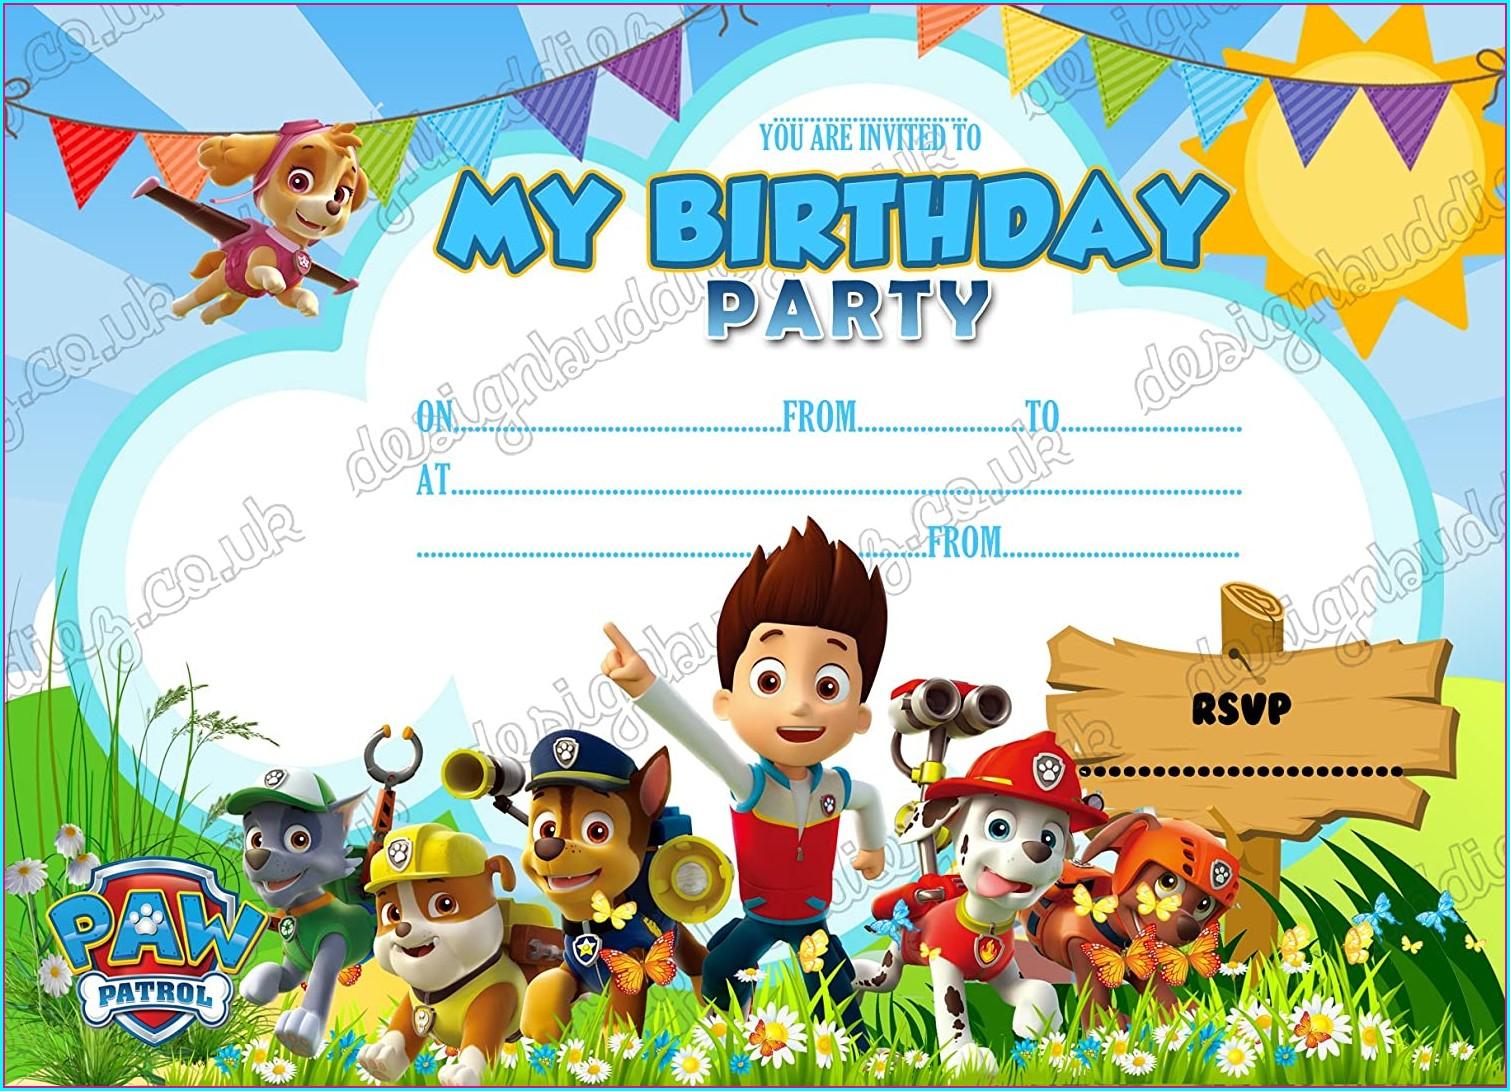 Paw Patrol Birthday Party Invitations